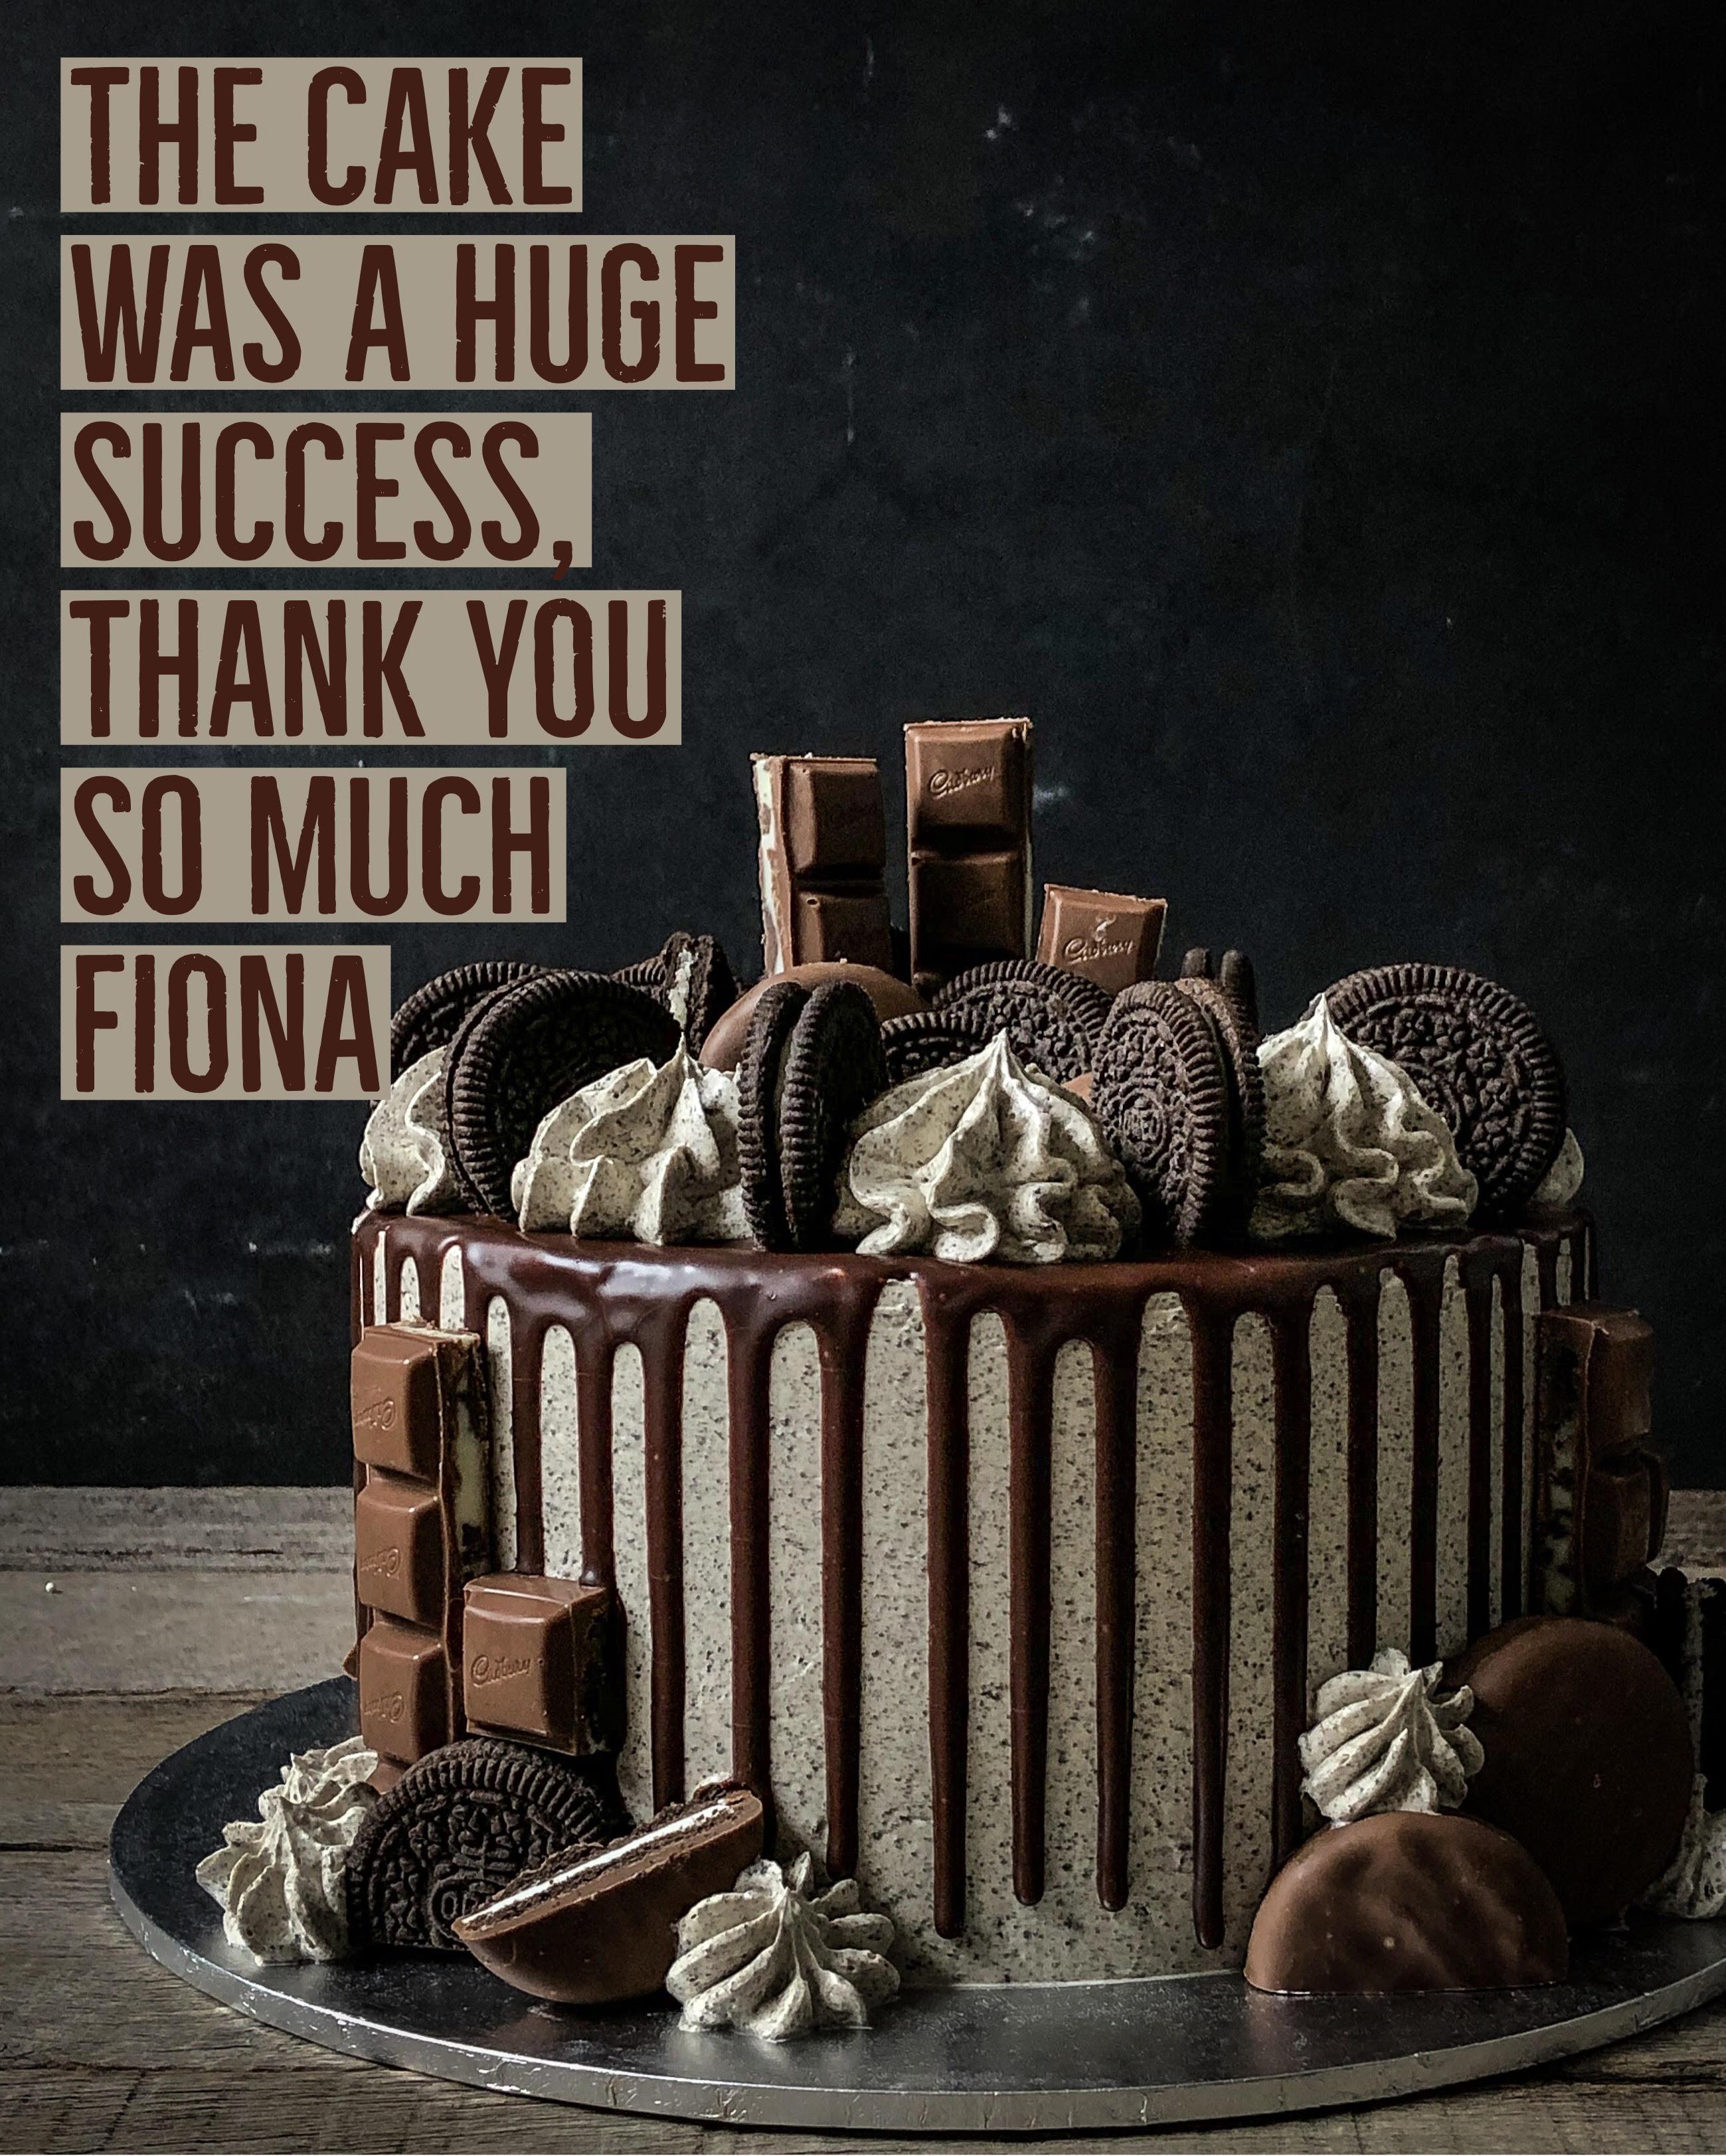 Sydney Cakes, Baked By Fiona Oreo explosion cake